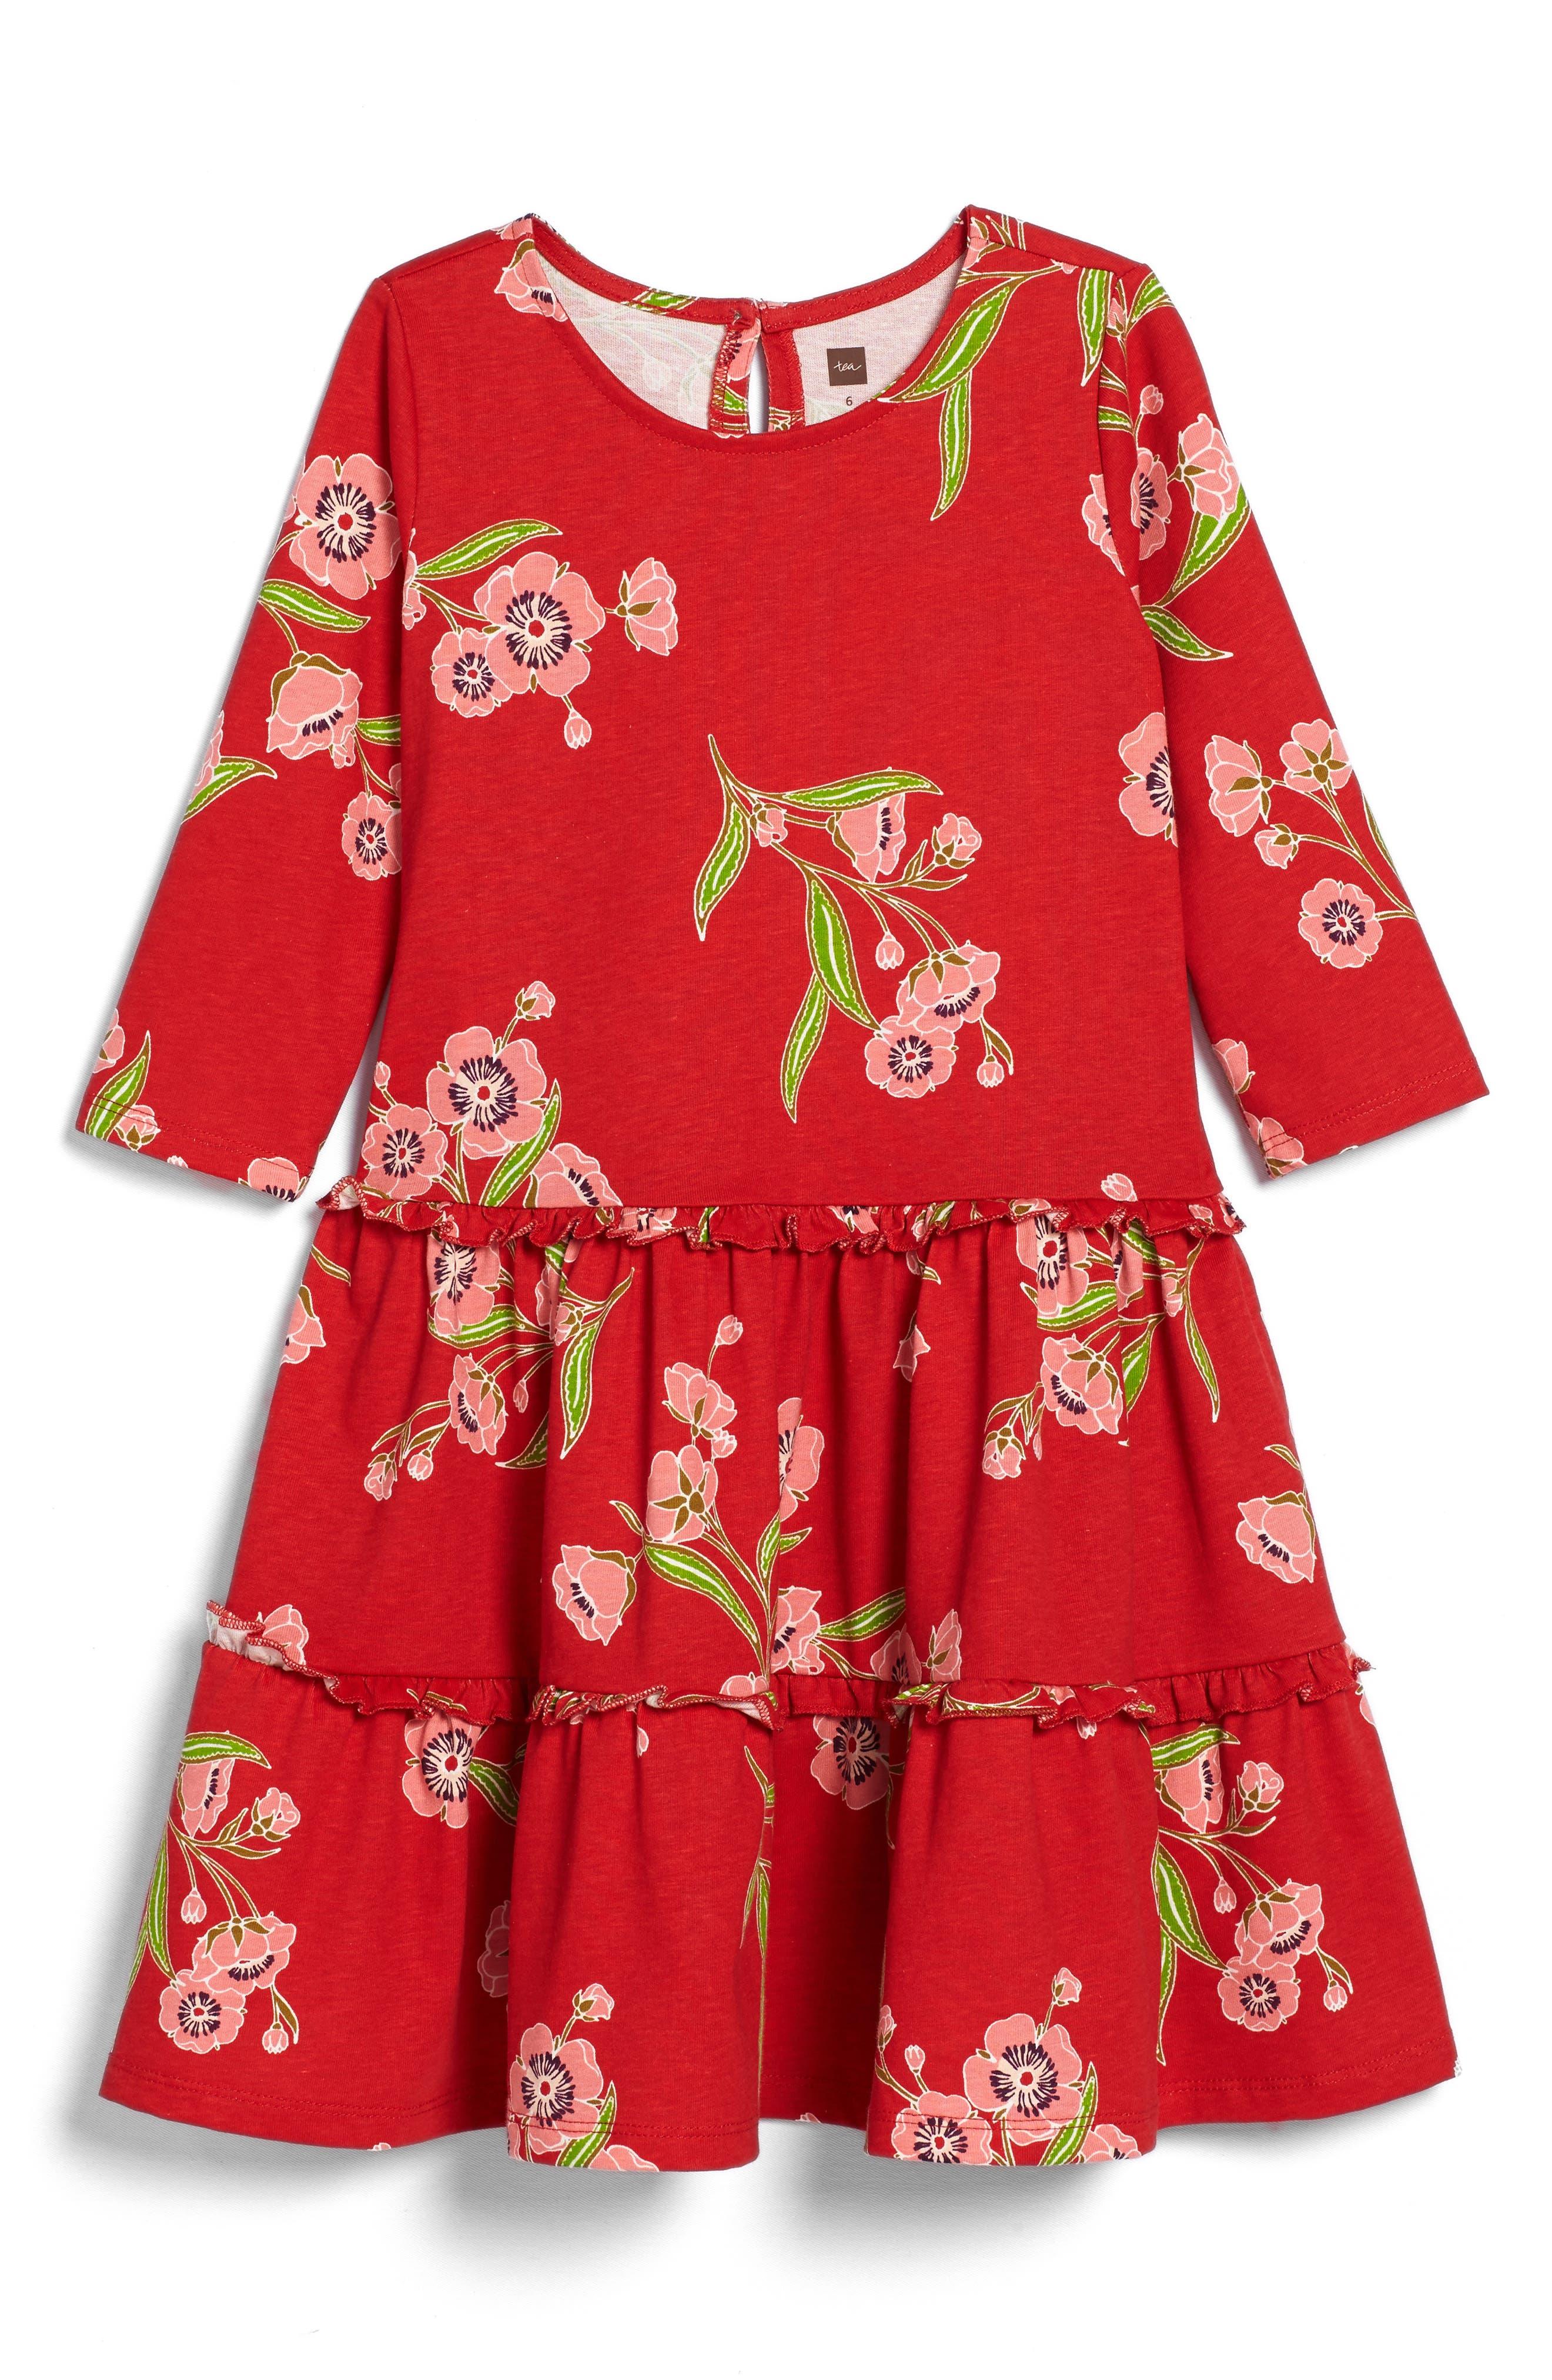 Rowan Floral Print Tiered Dress,                             Main thumbnail 1, color,                             615